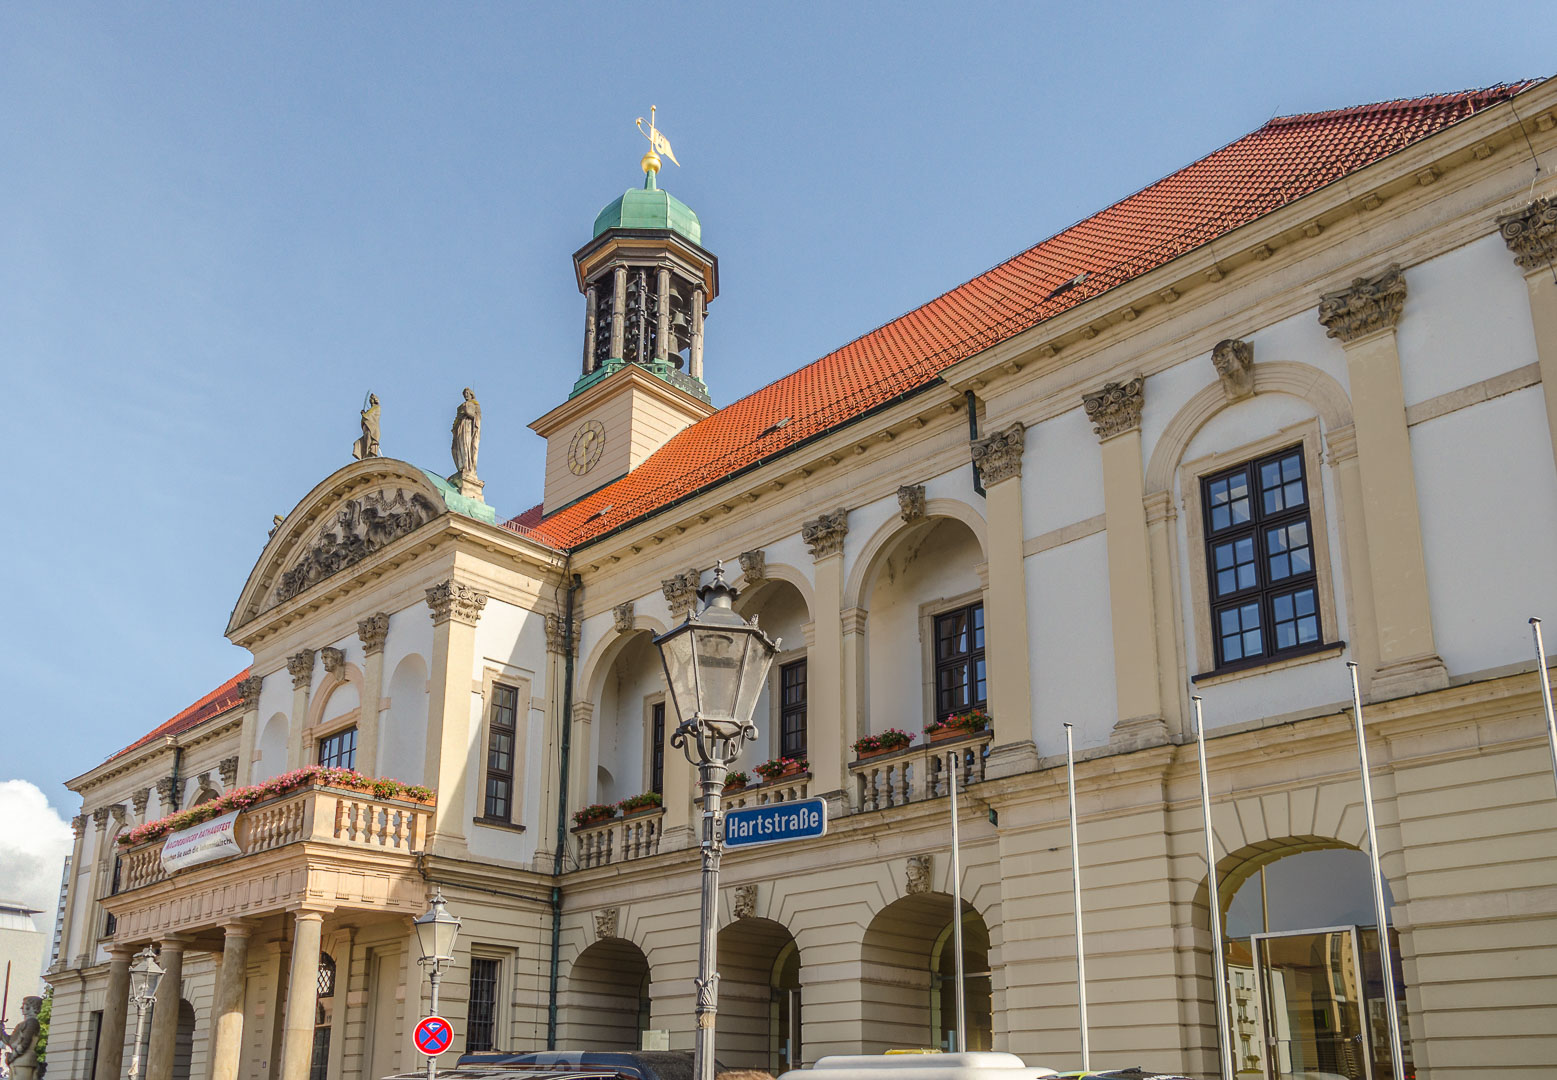 Alter-Markt-Magdeburg